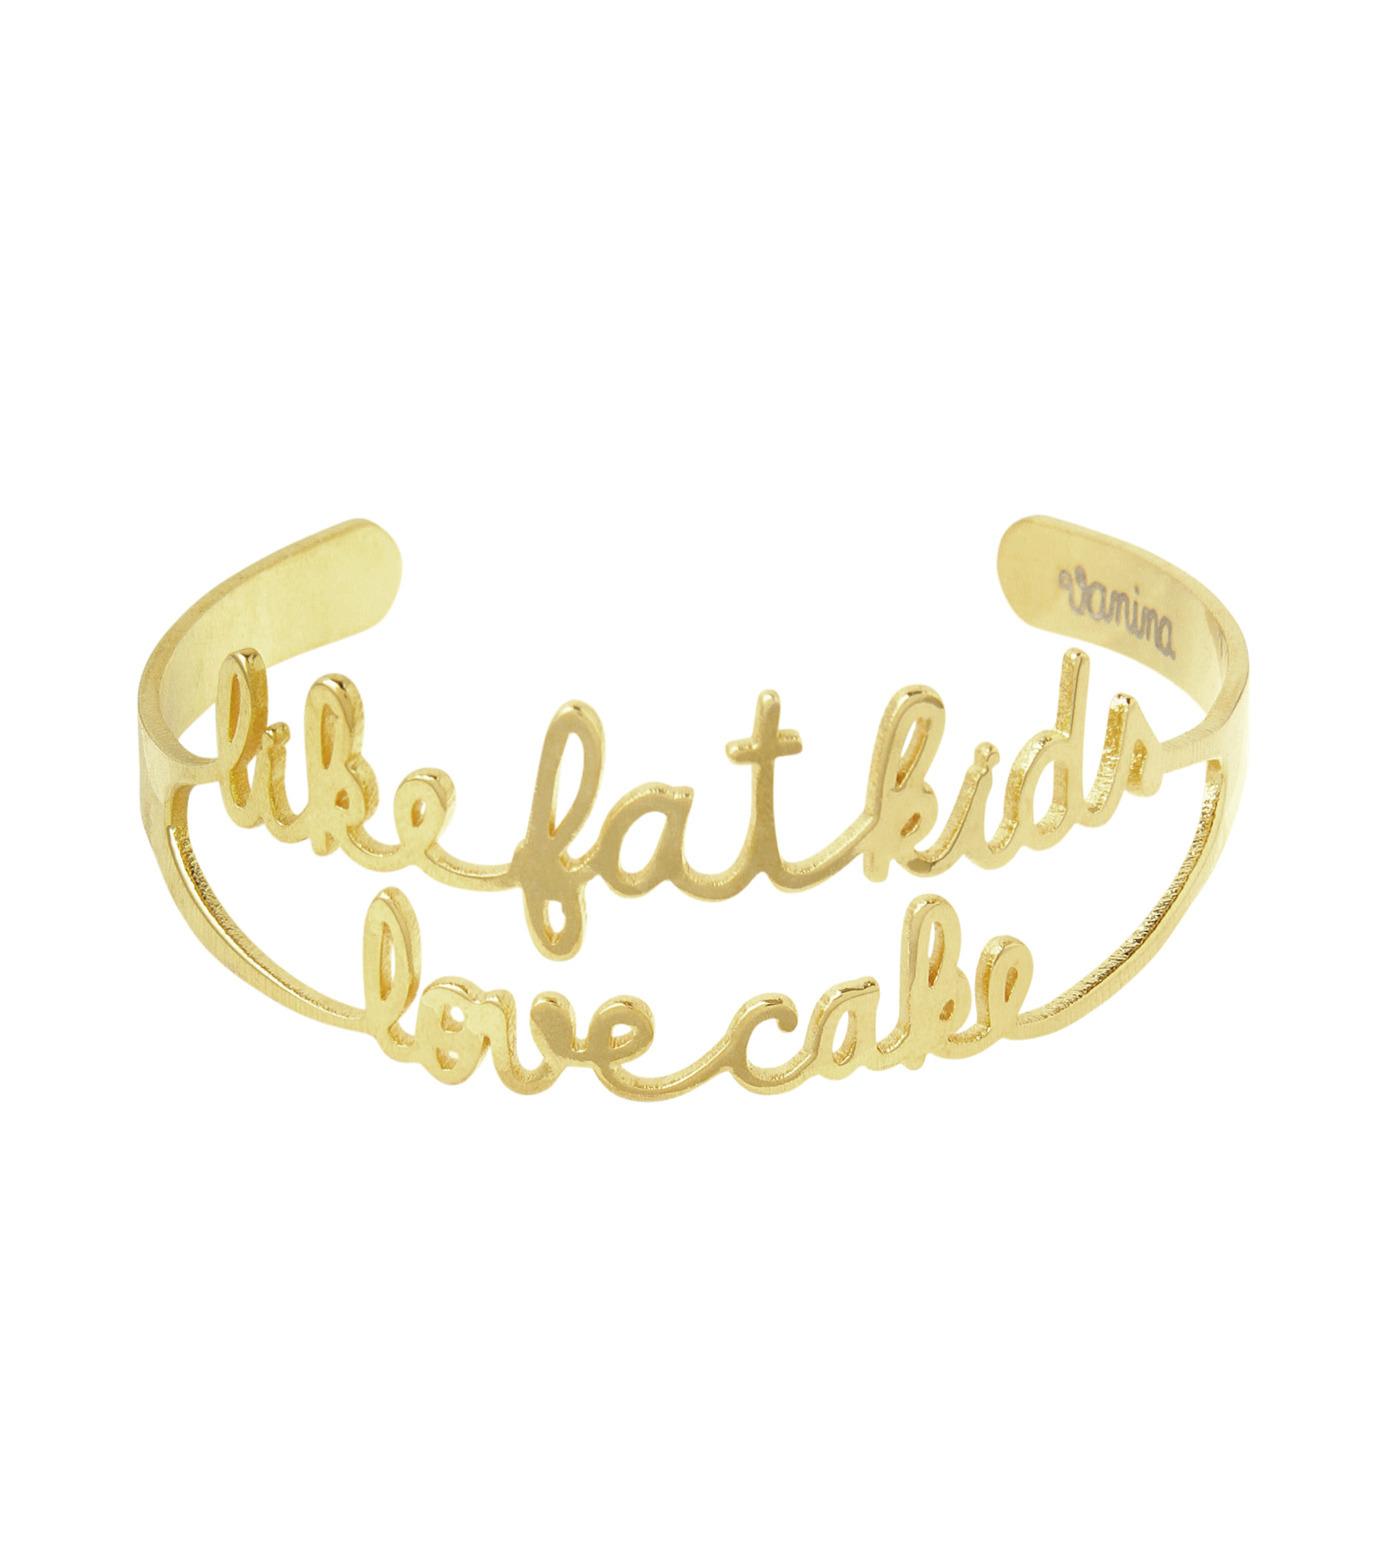 VANINA(バニーナ)のLike Fat Kids Love Cake Bracelet-GOLD(アクセサリー/accessory)-LIKE-Kids-L 拡大詳細画像1